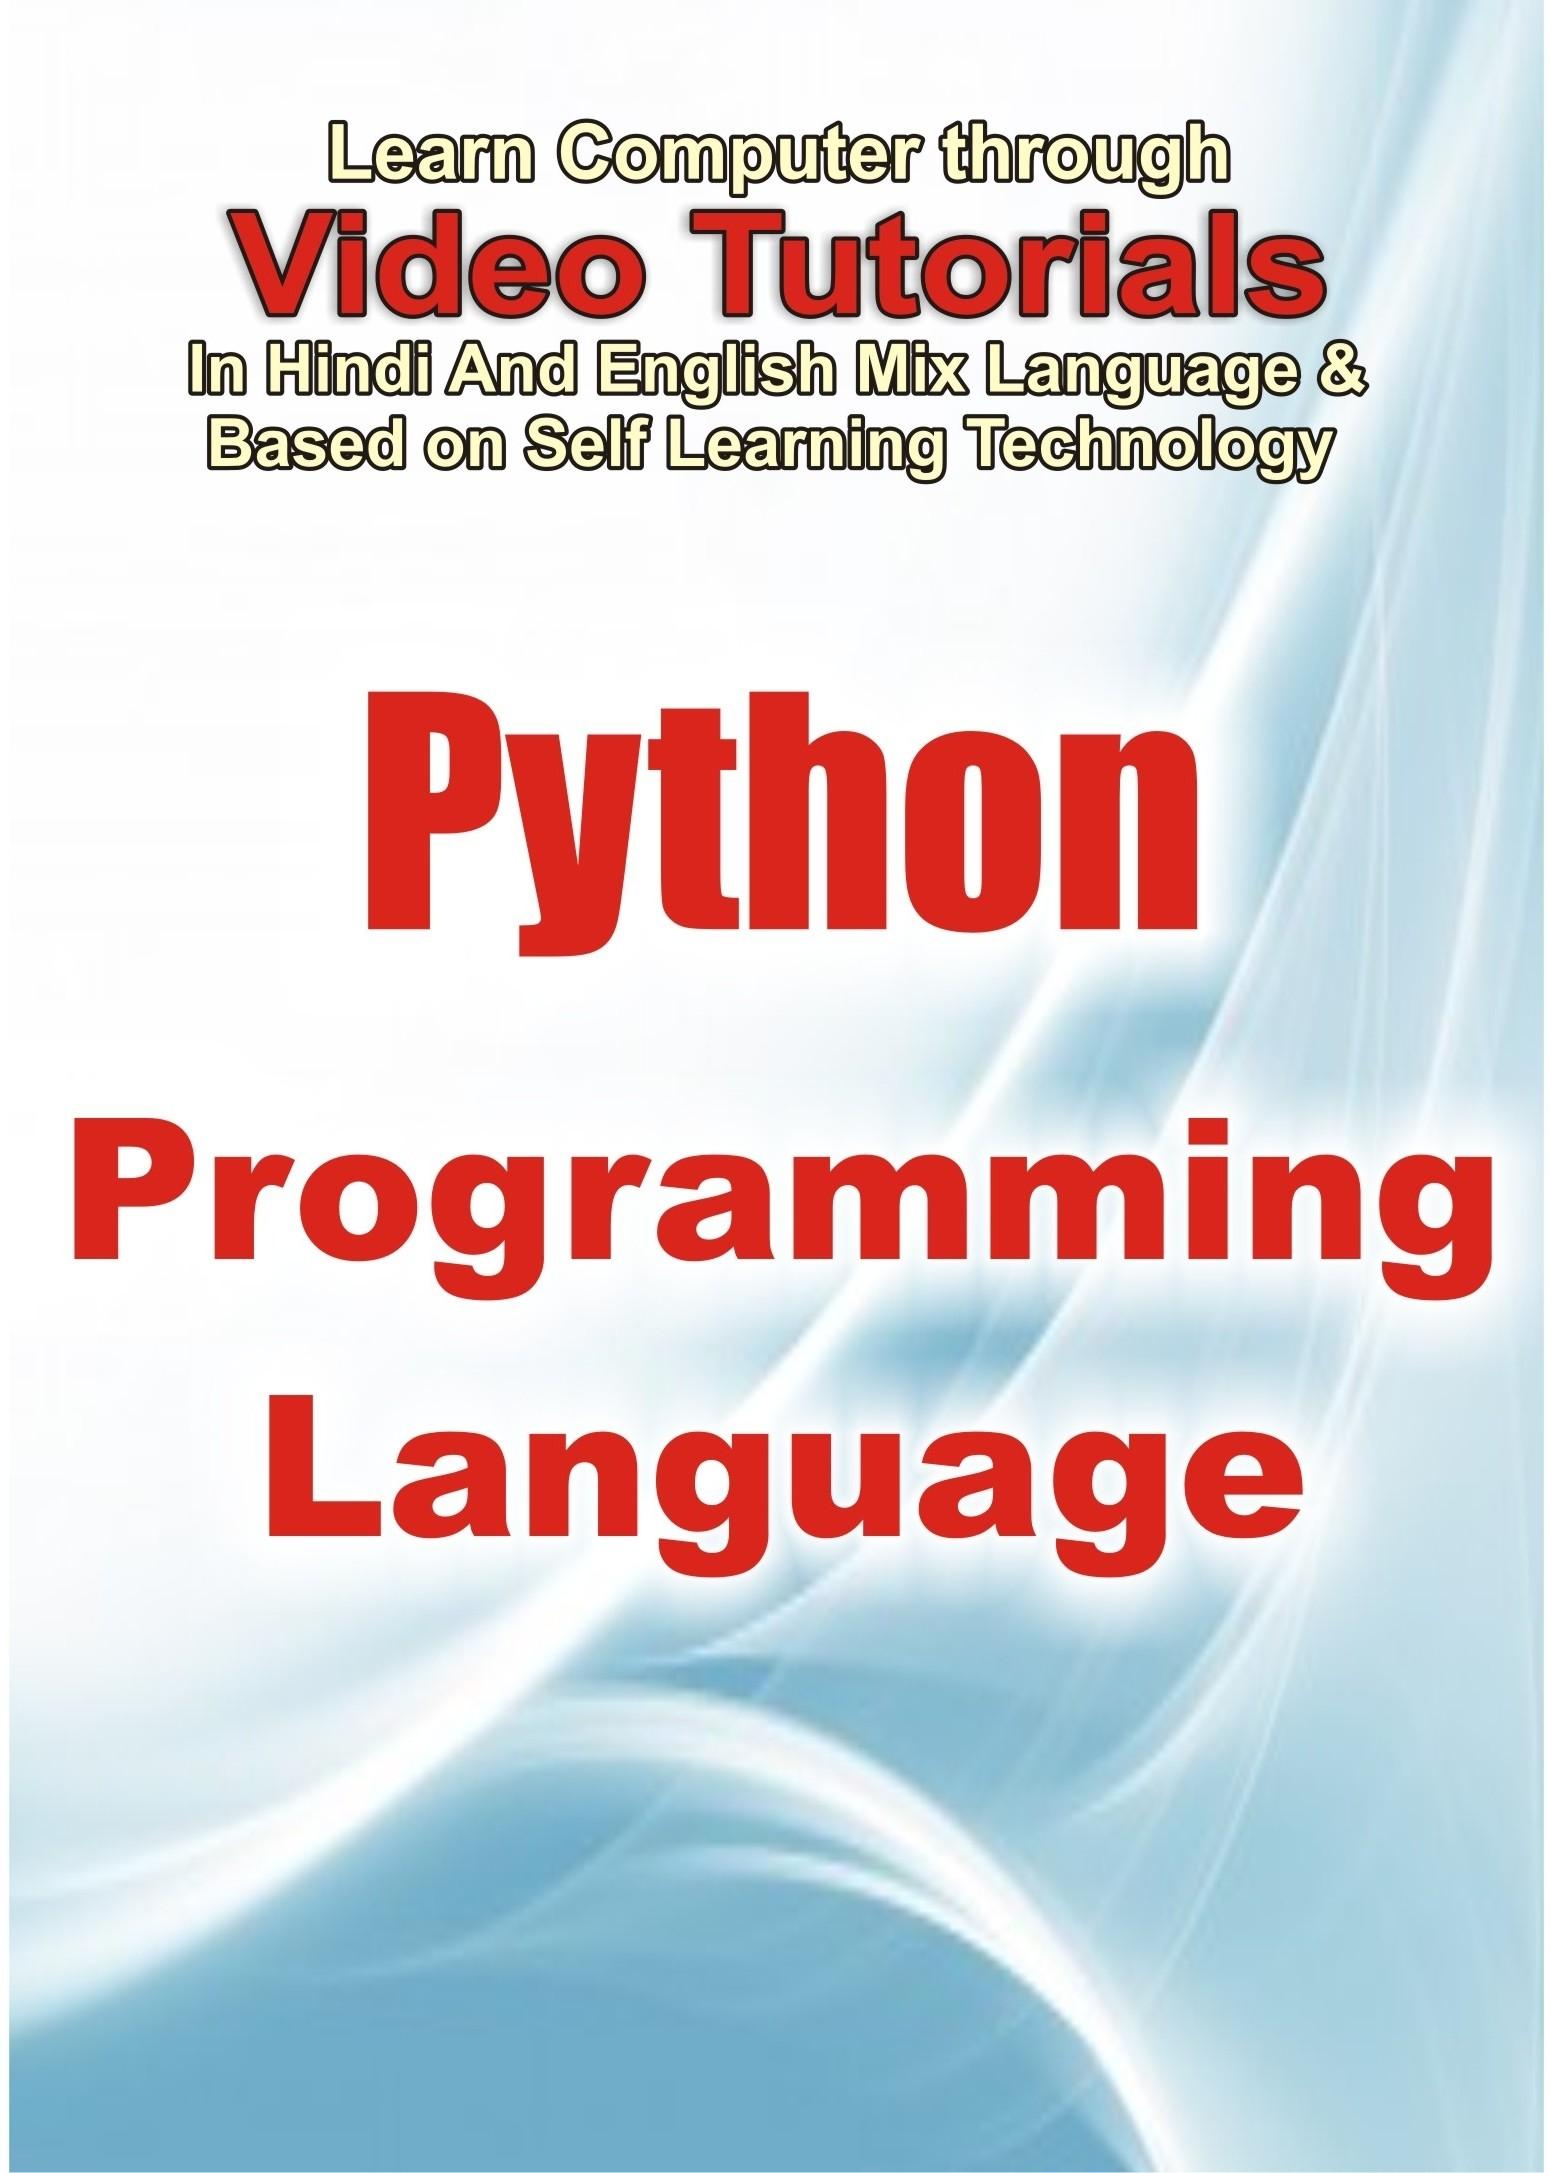 Lsoit PythonProgramming Tutorials DVD(DVD)